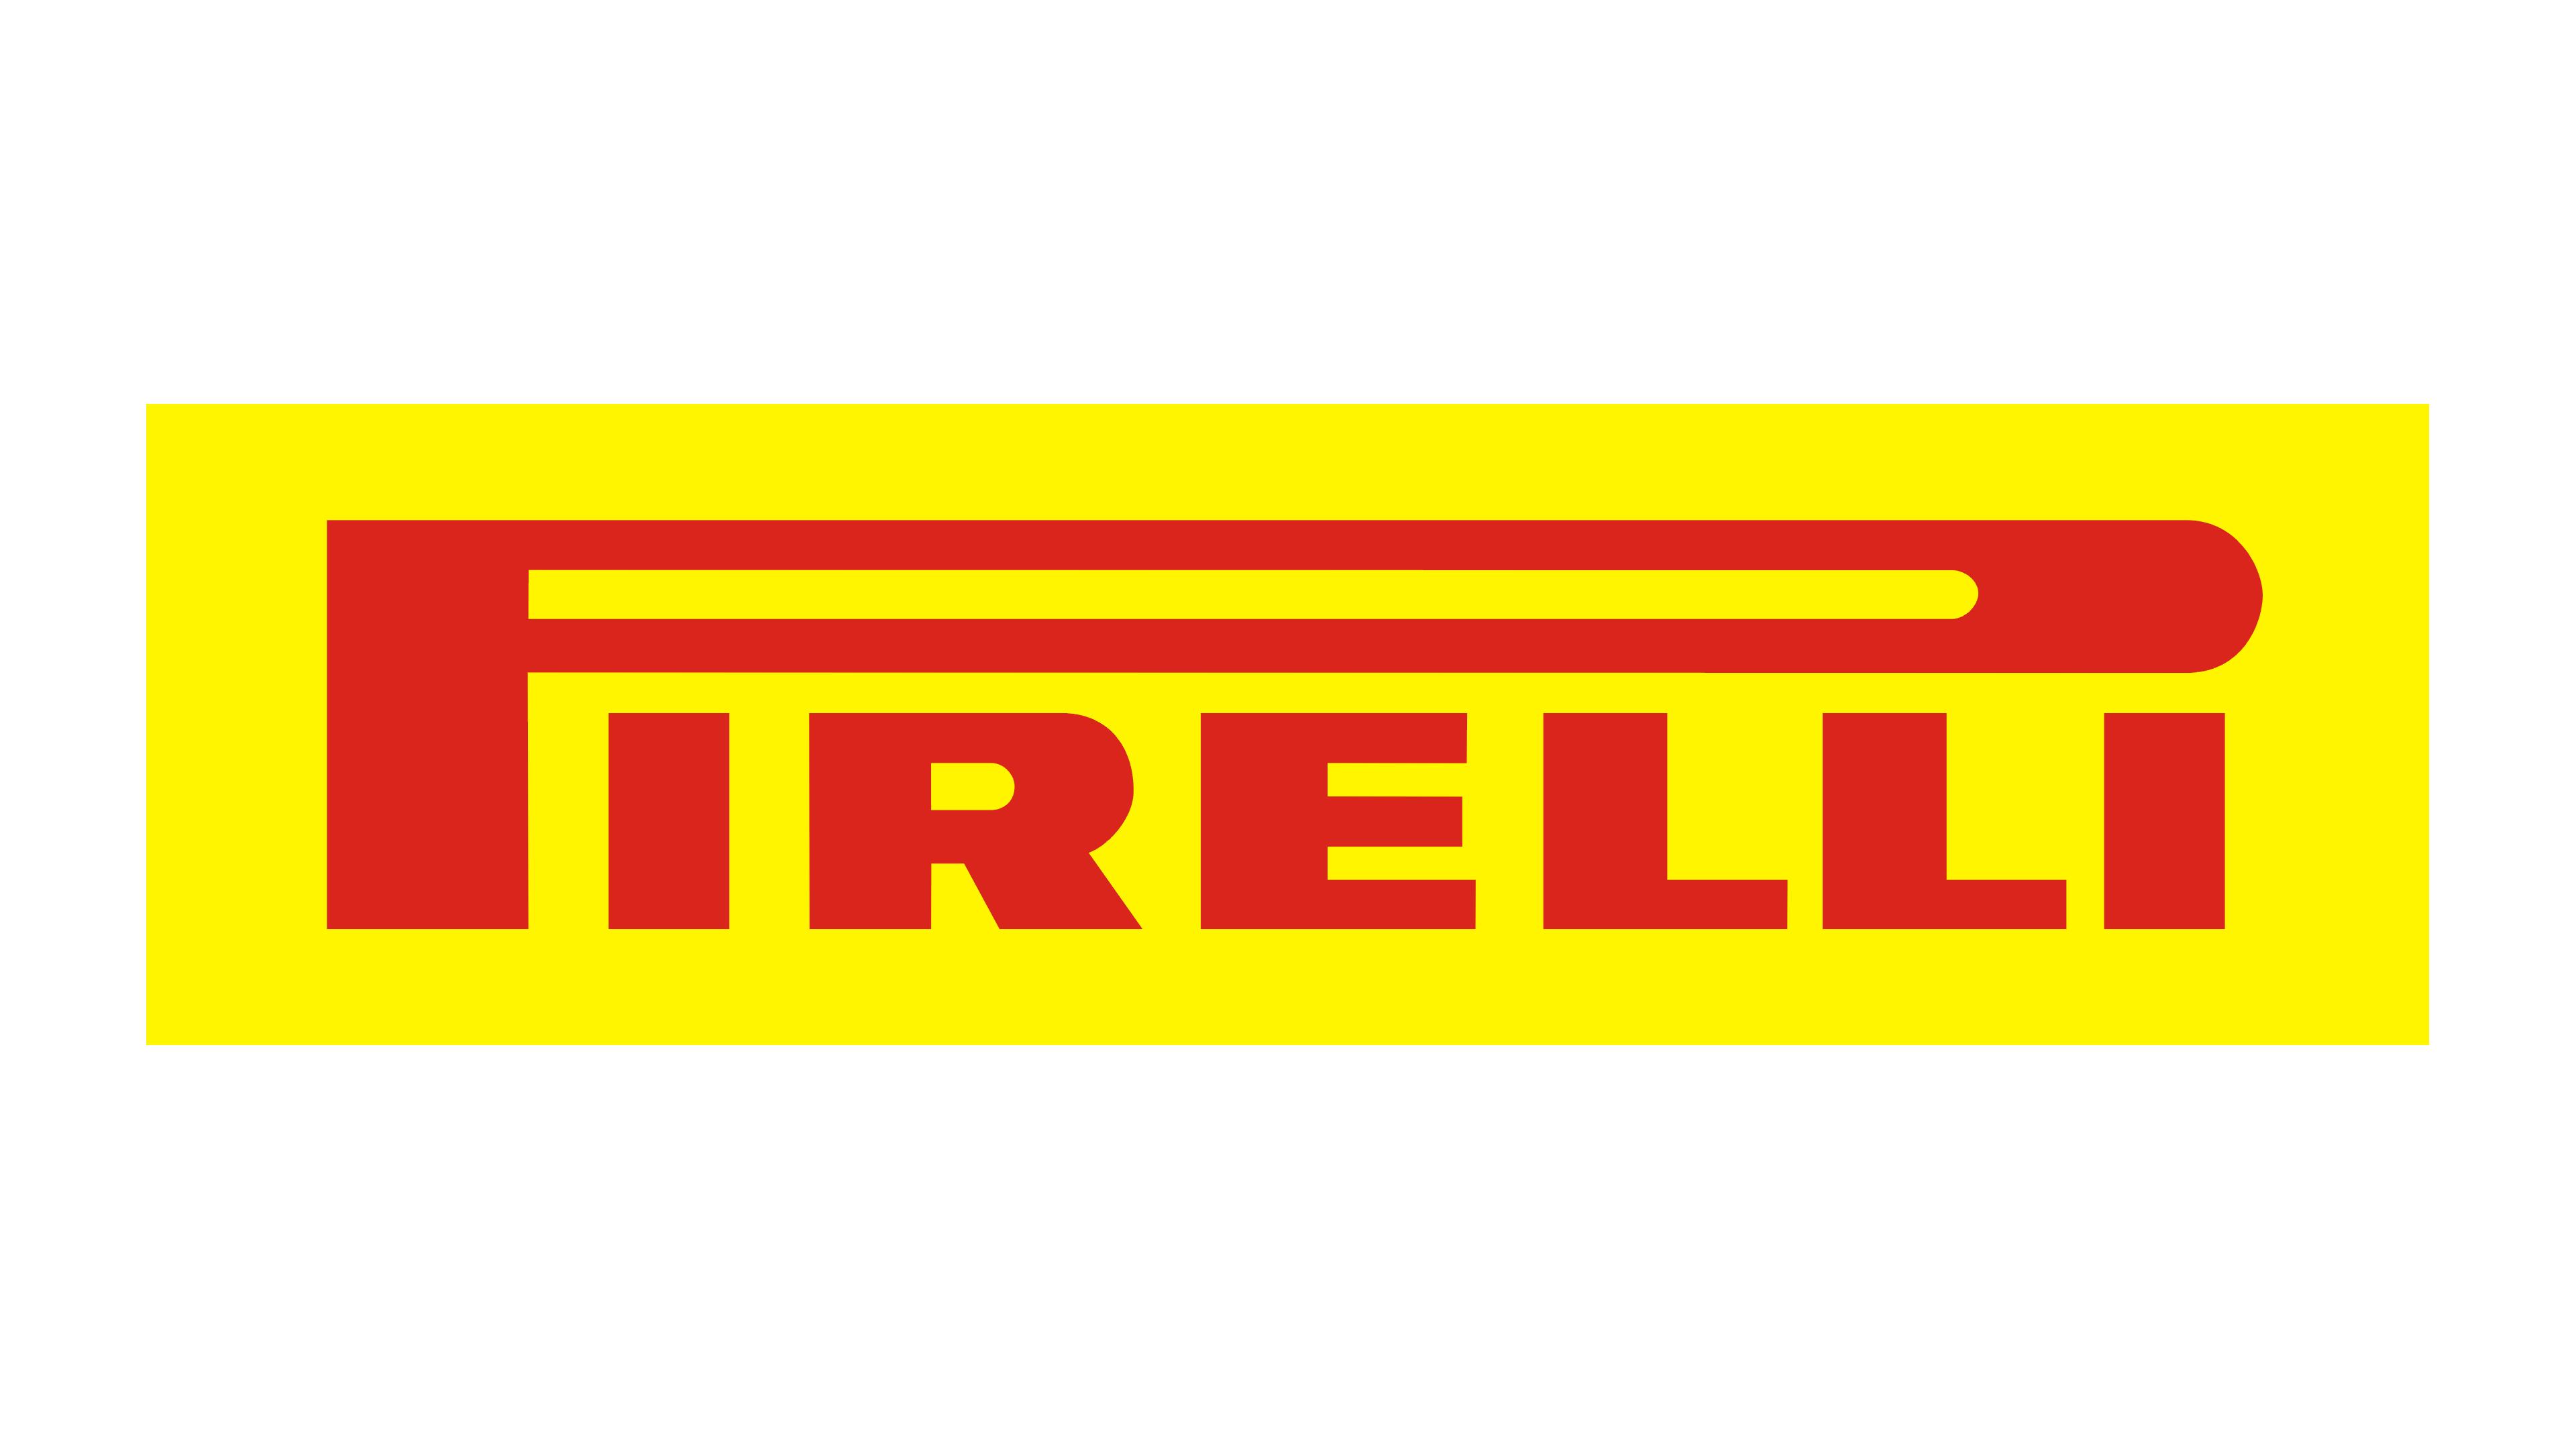 Pirelli-logo-3840x2160